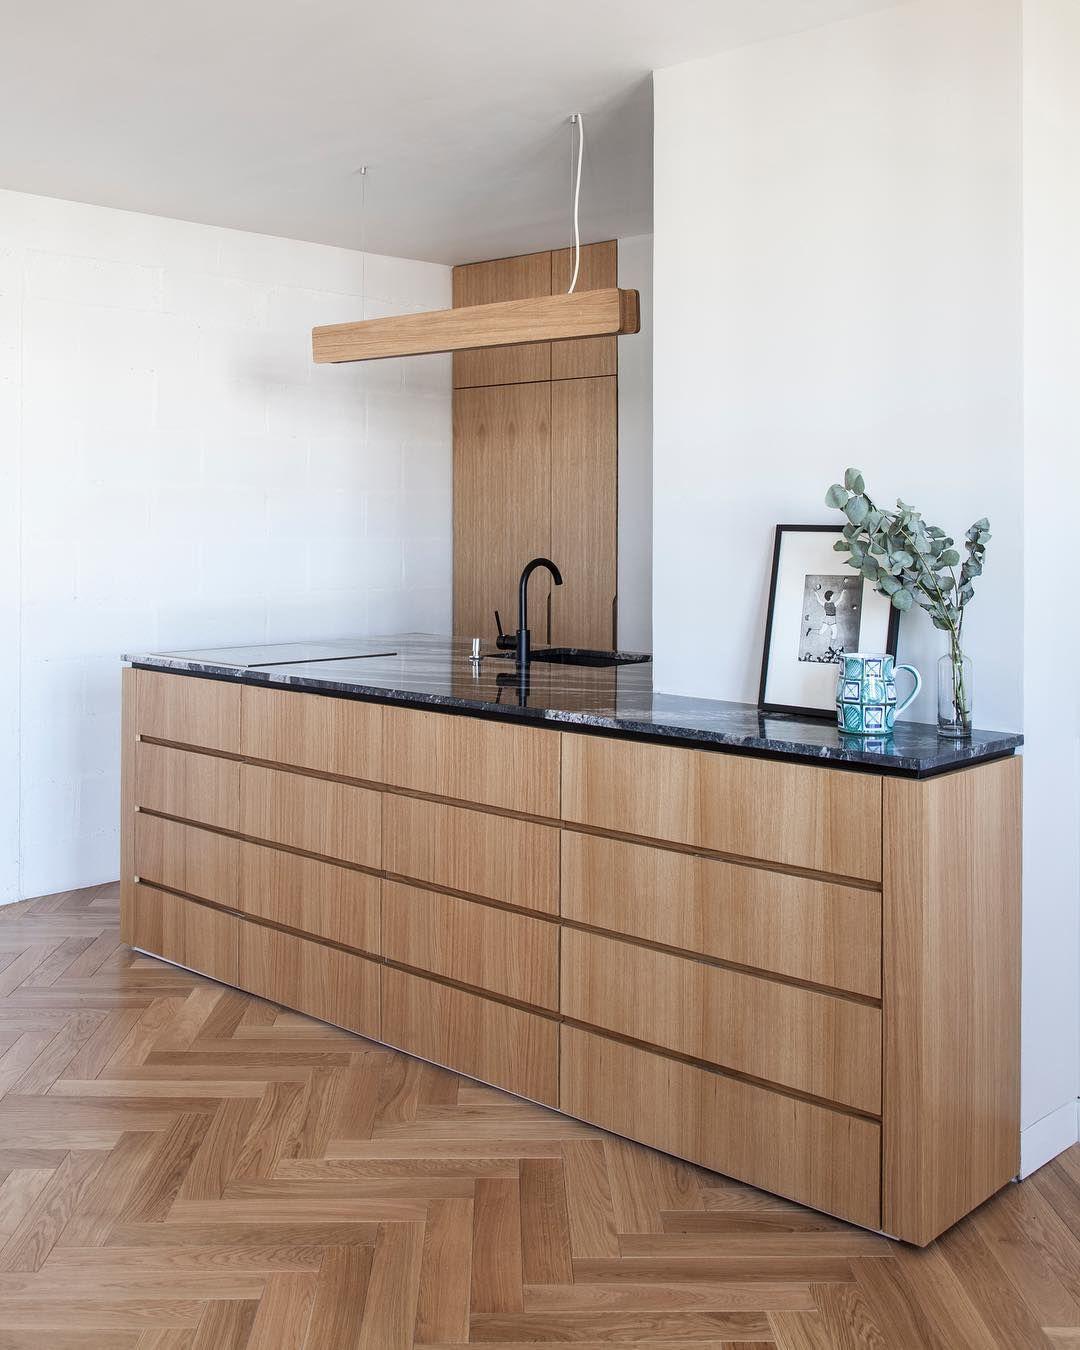 Atelier D Architecture Paris On Instagram Gambetta La Cuisine En Chene Sur Mesure Chene Oak Surmesure Cuisine Chene Chene Renovation Appartement